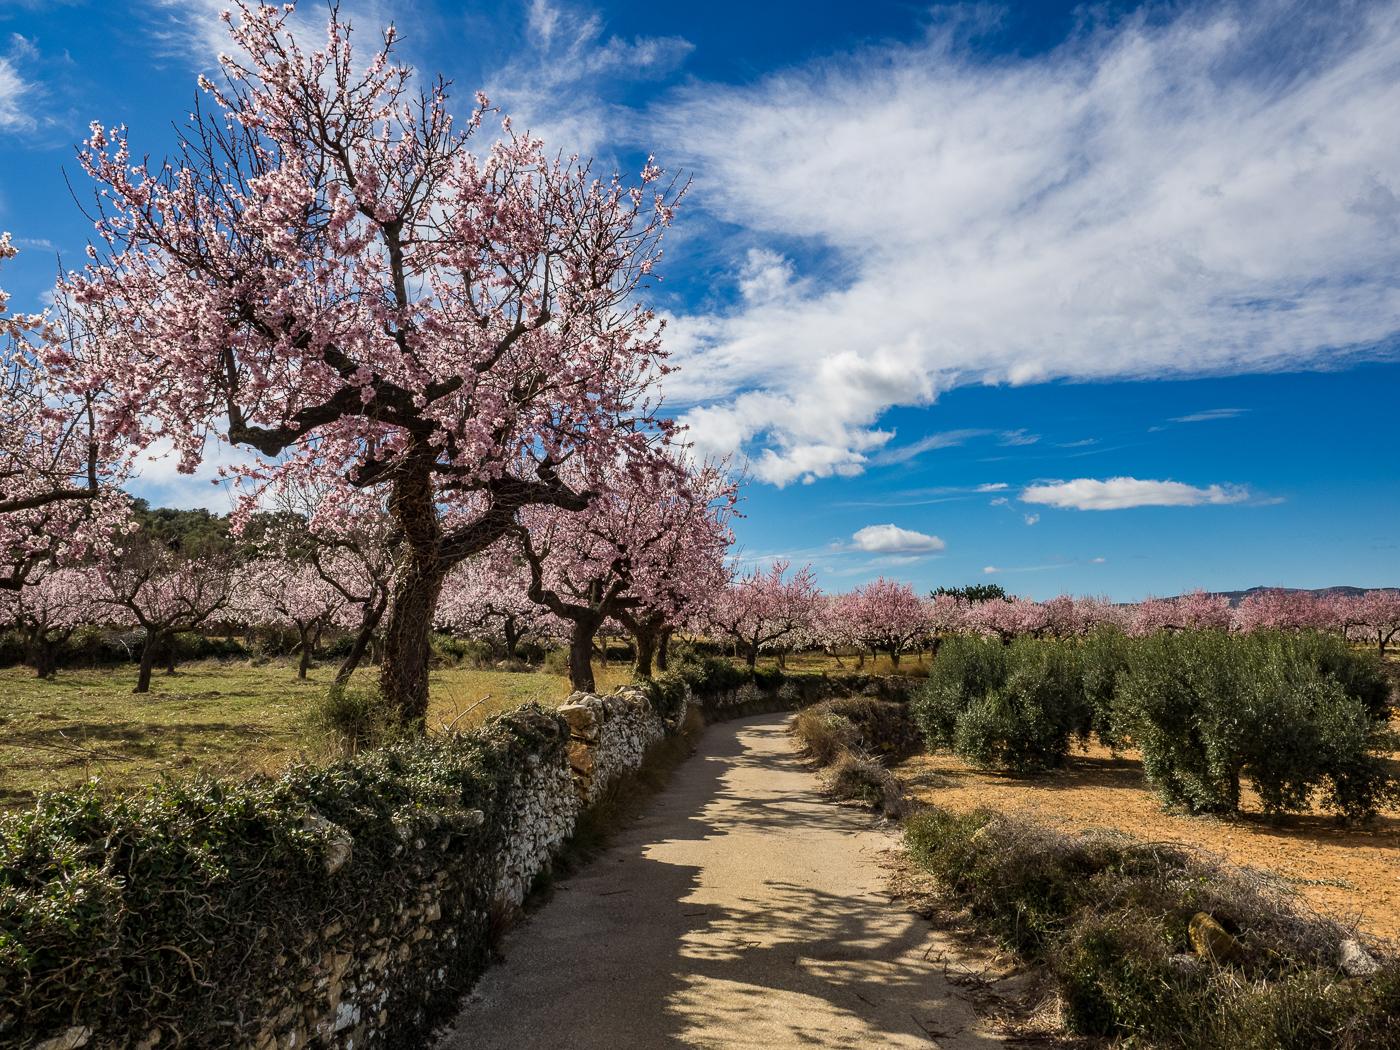 Almond blossoms in spring, El Maestrat, SPain